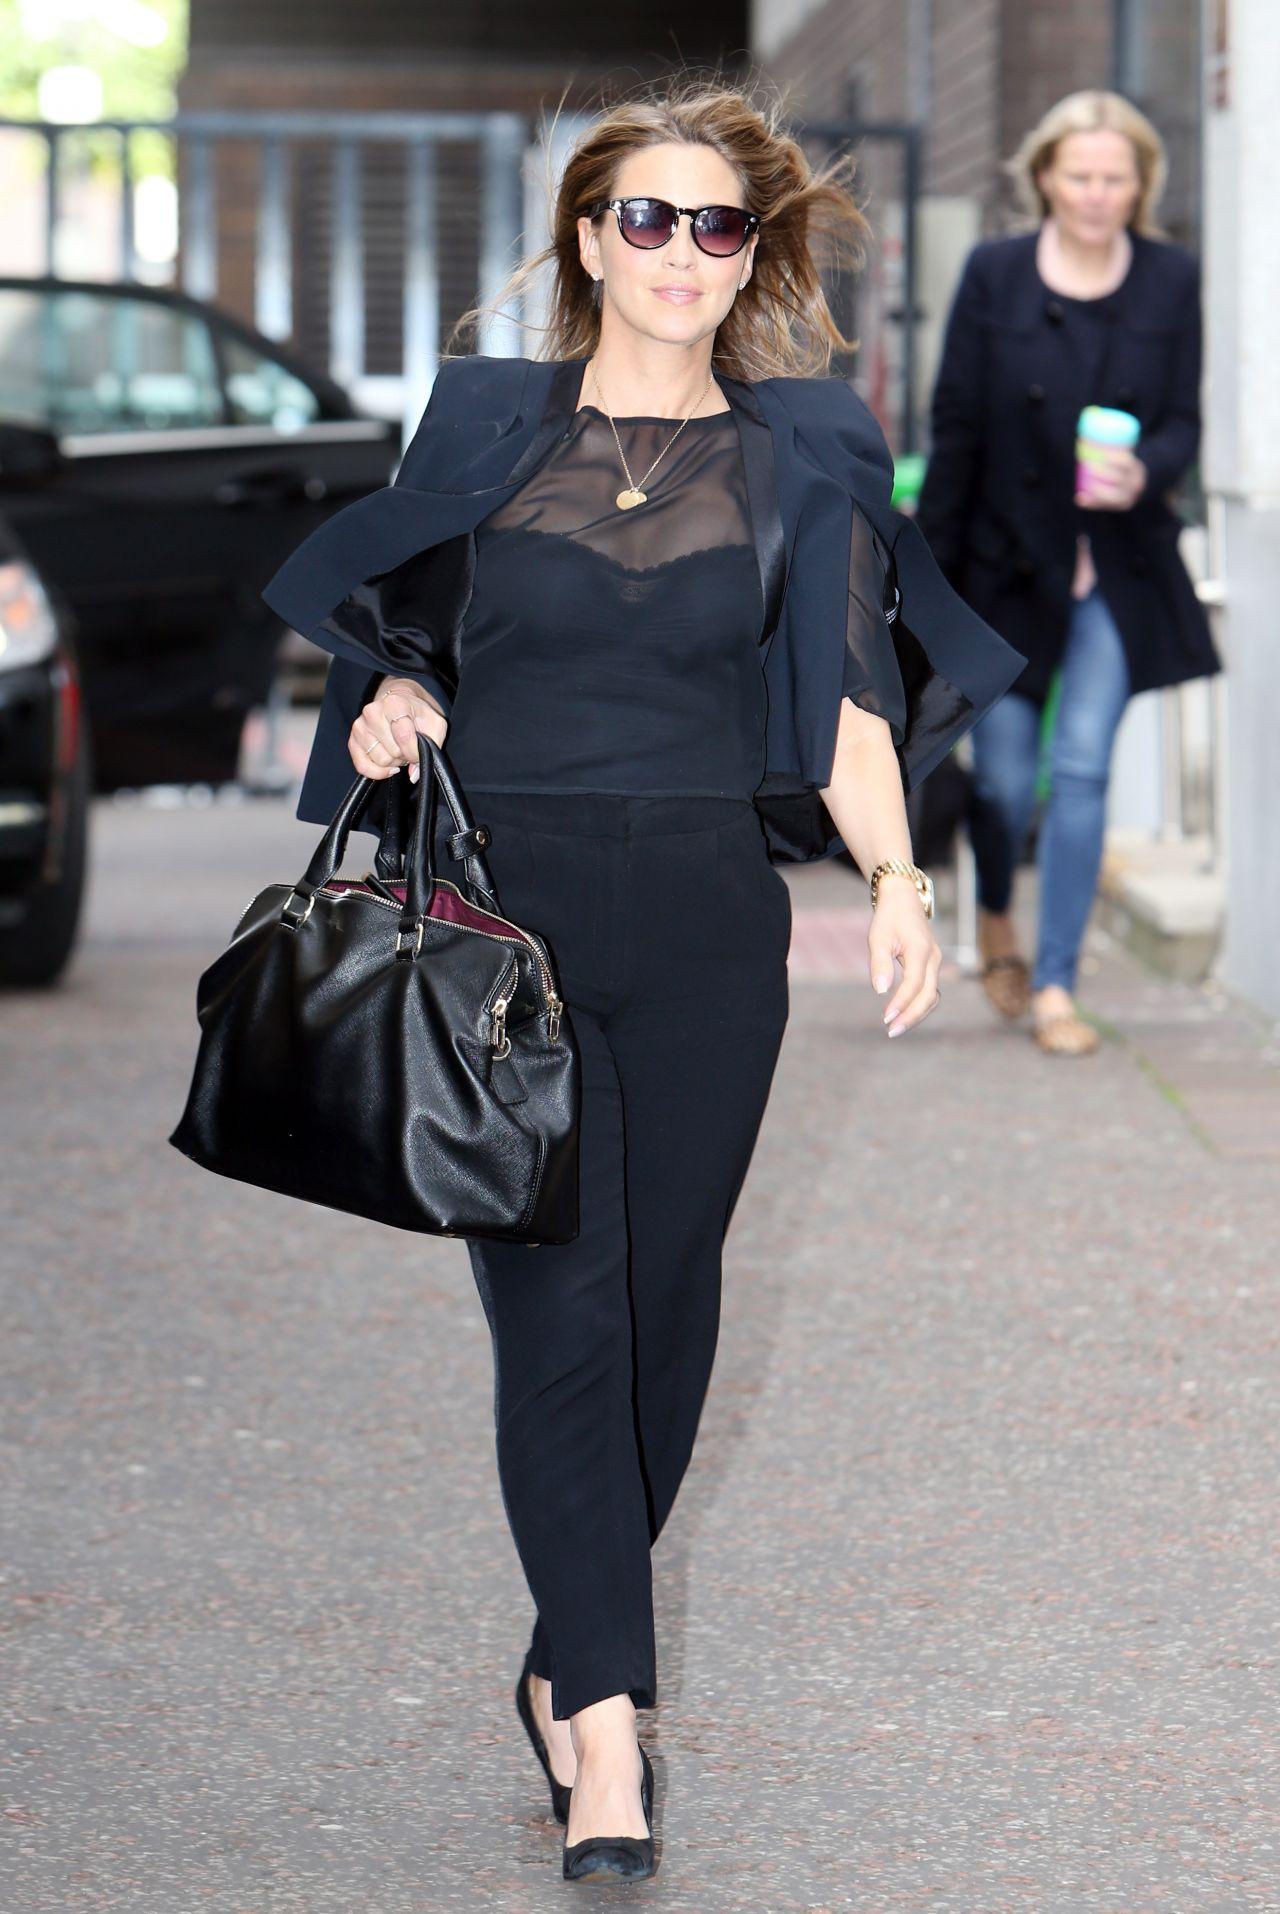 Rachel Stevens Casual Style - ITV Studios, June 2014